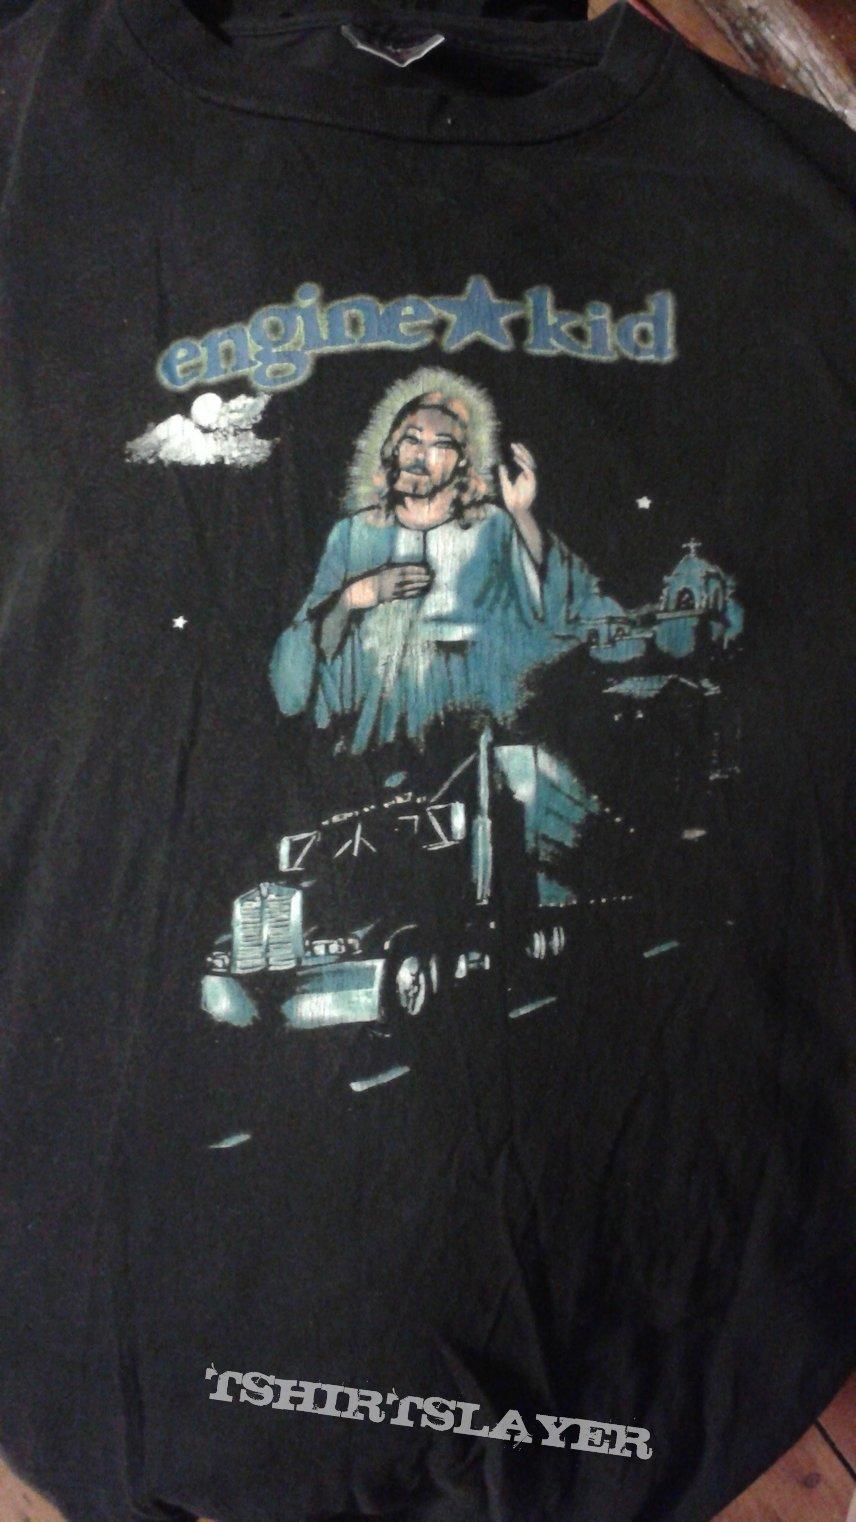 "Engine Kid ""jesus trucker"" t-shirt."